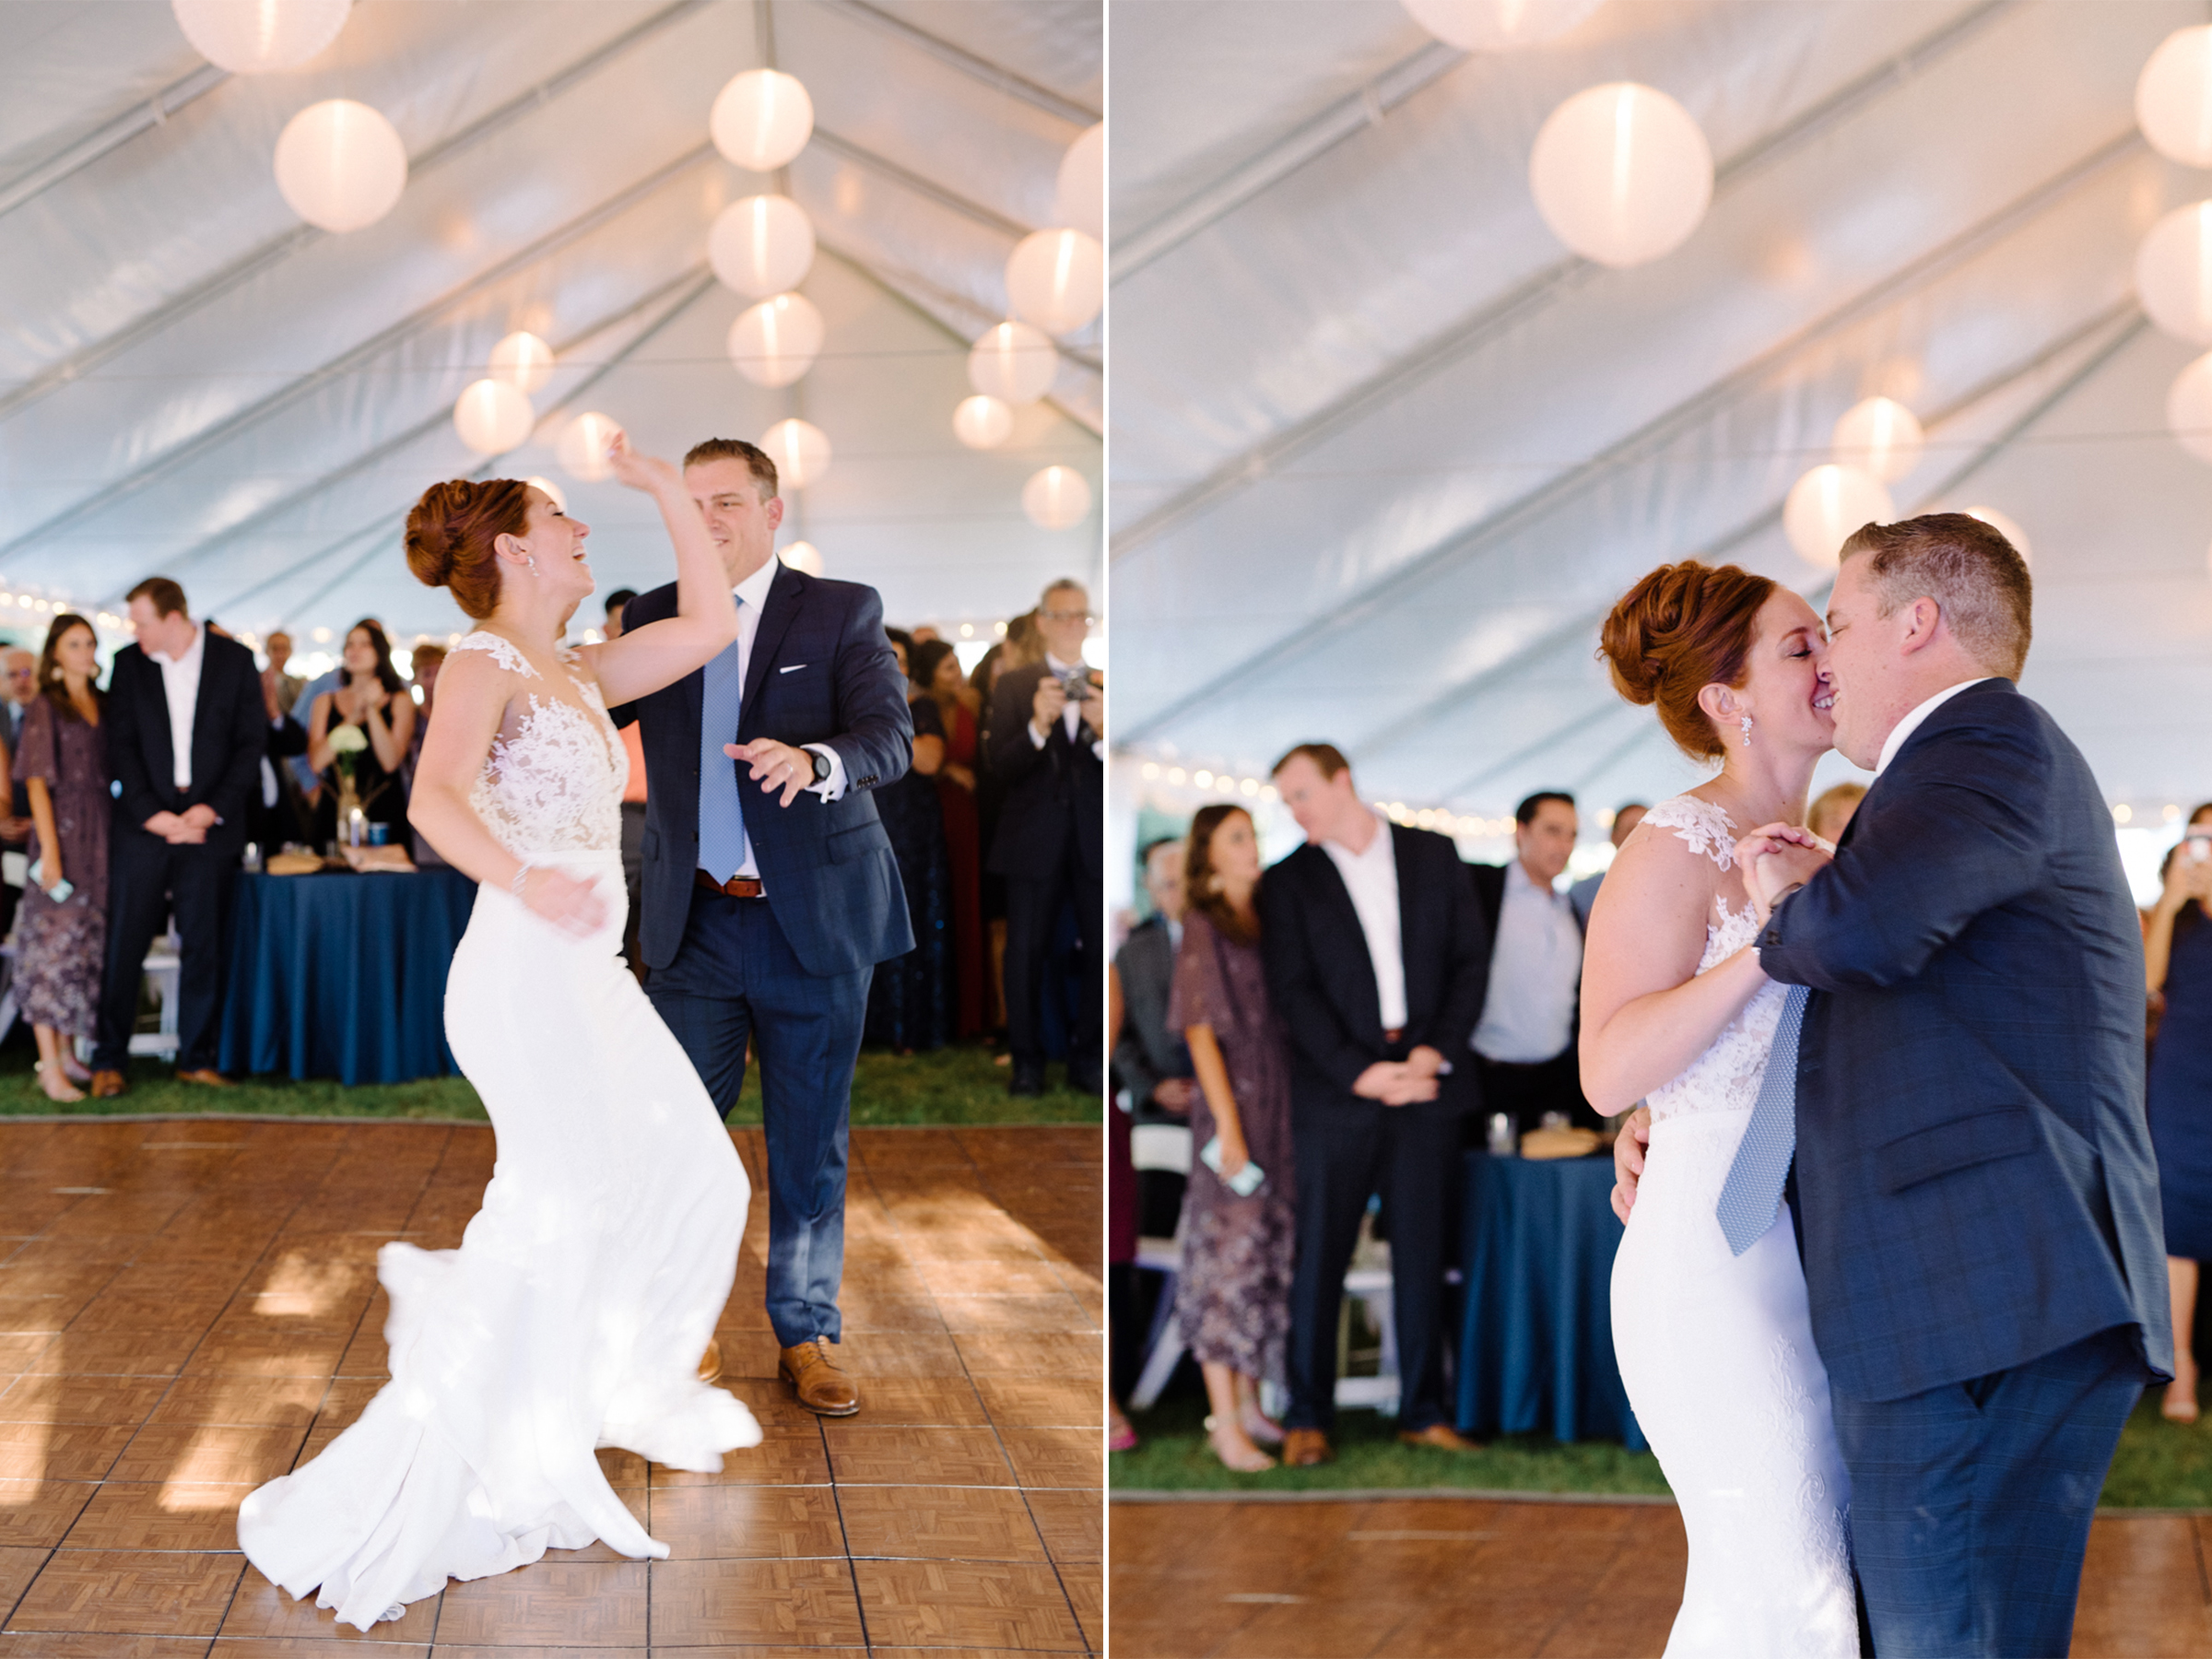 Lauren+AJ- Bride and Groom First Dance Tent Wedding- DIY Backyard Wedding- New Jersey- Olivia Christina Photo.jpg